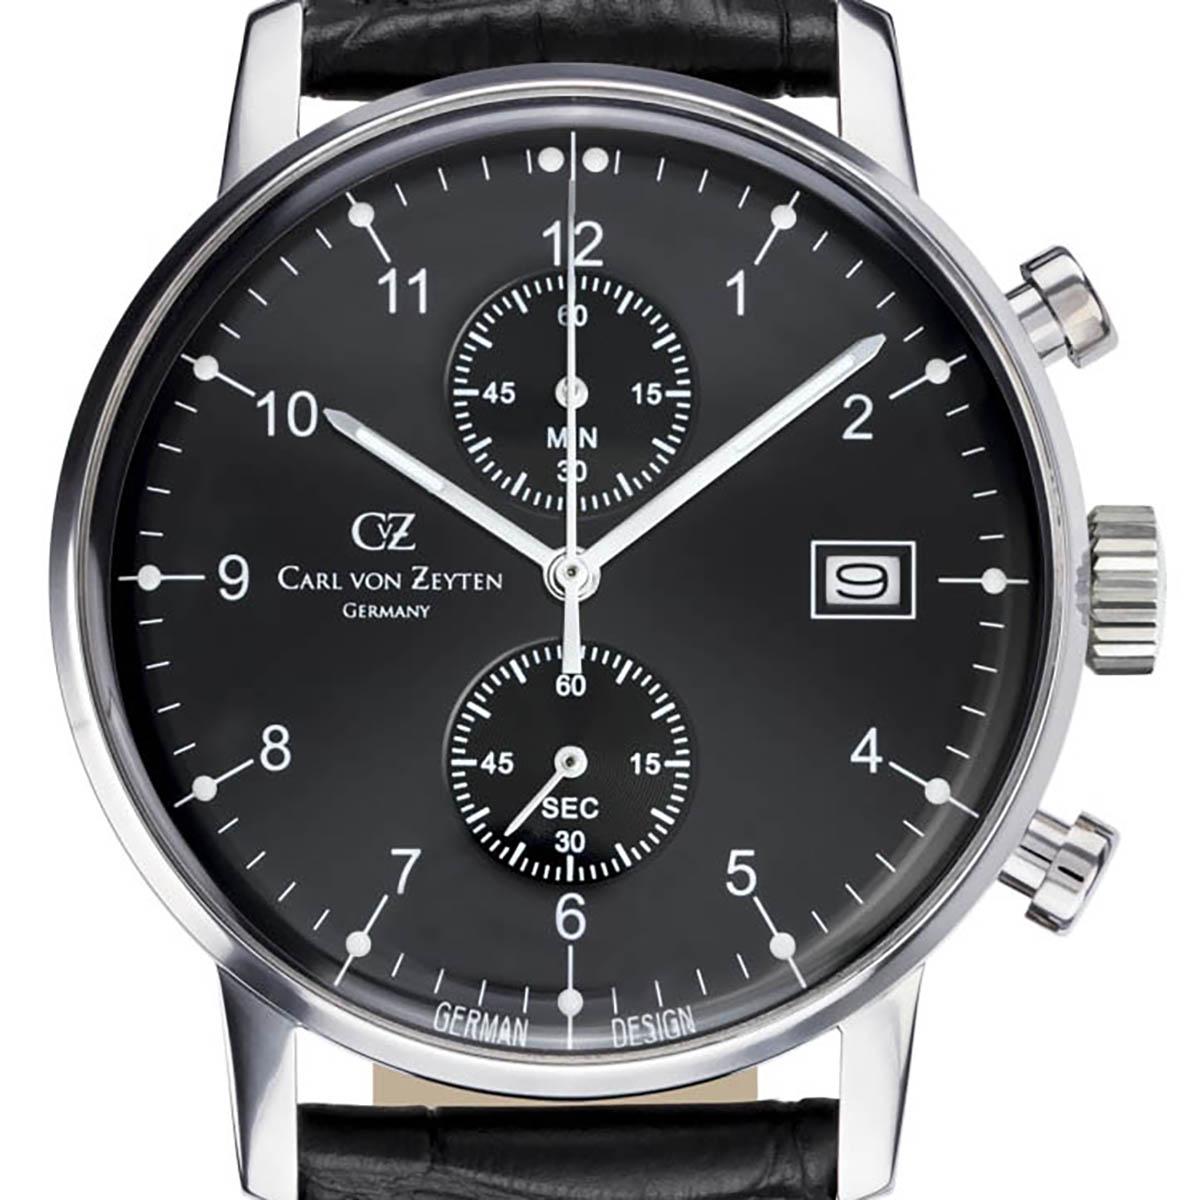 Carl von Zeyten カール・フォン・ツォイテン 電池式クォーツ 腕時計 [CvZ0007BK] 正規品  クロノグラフ